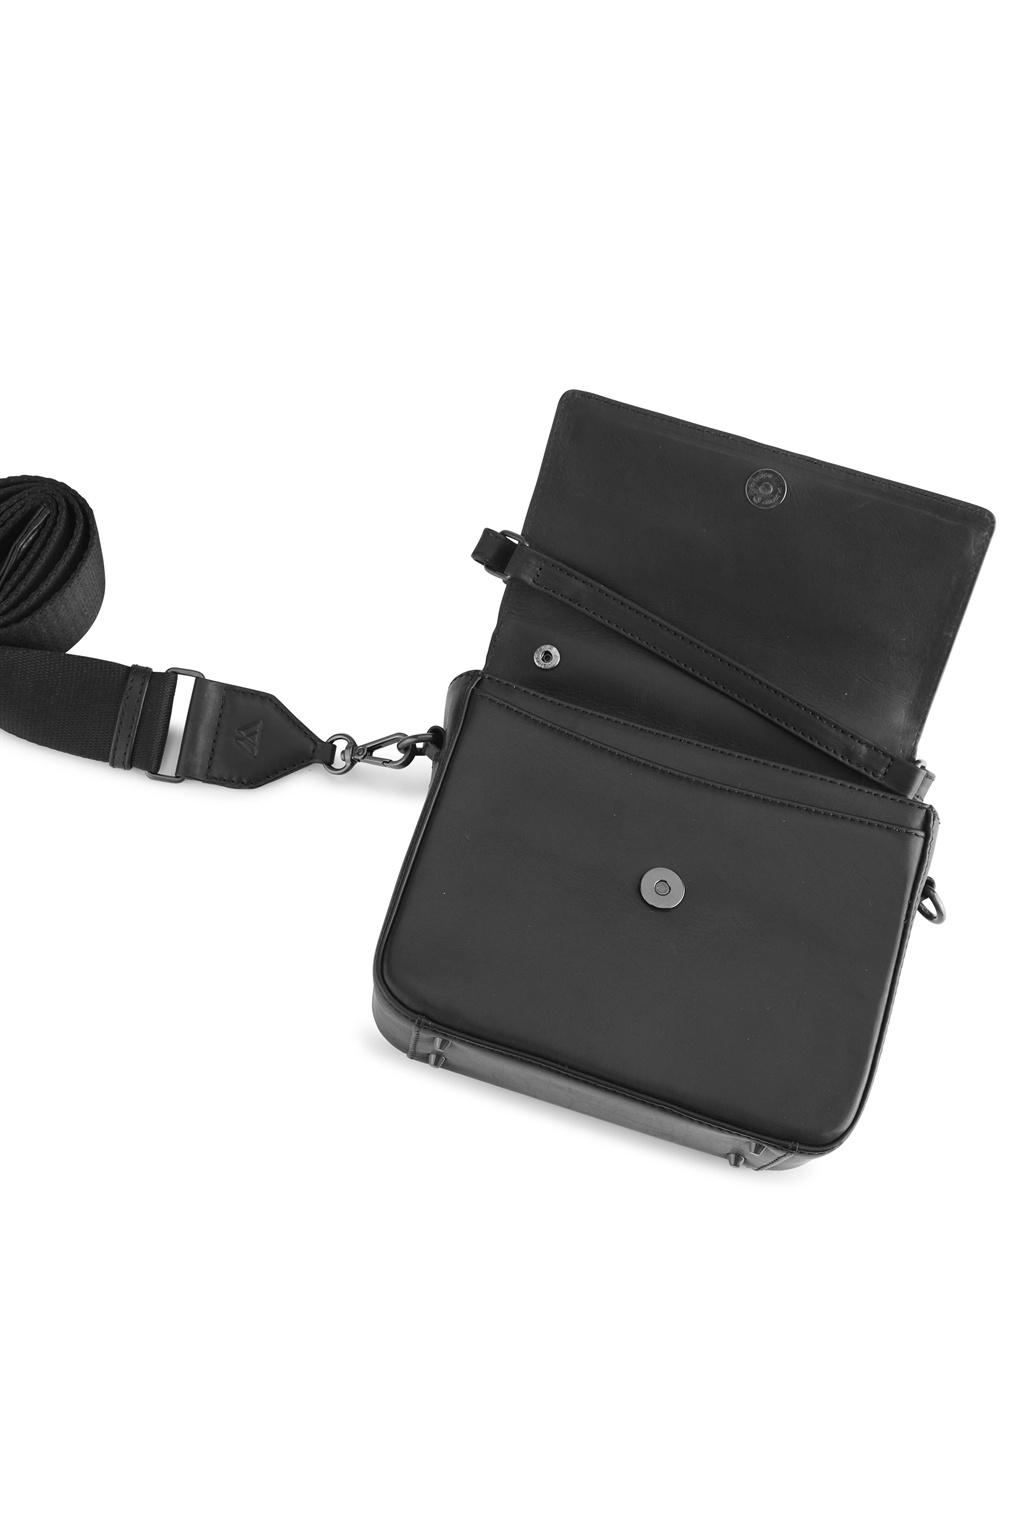 Adora Large Crossbody Bag - Antique Black w/ Black-4